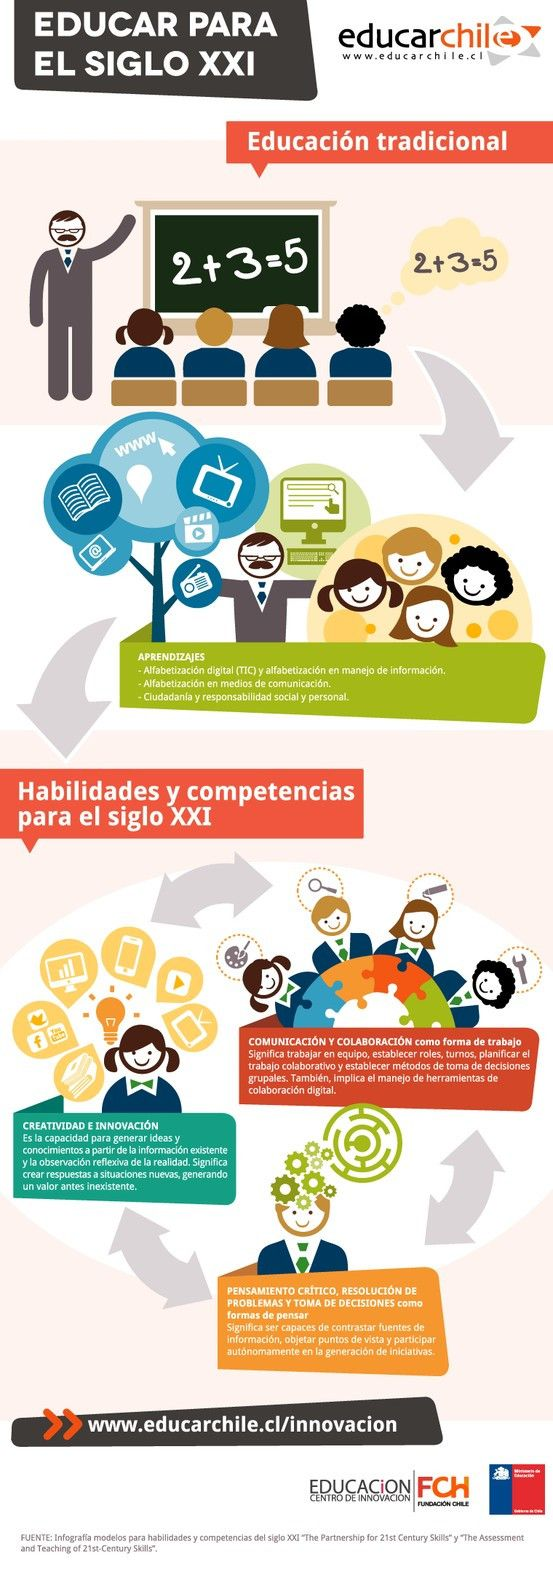 HabilidadesCompetenciasEducativasSigloXXI-Infografía-BlogGesvin